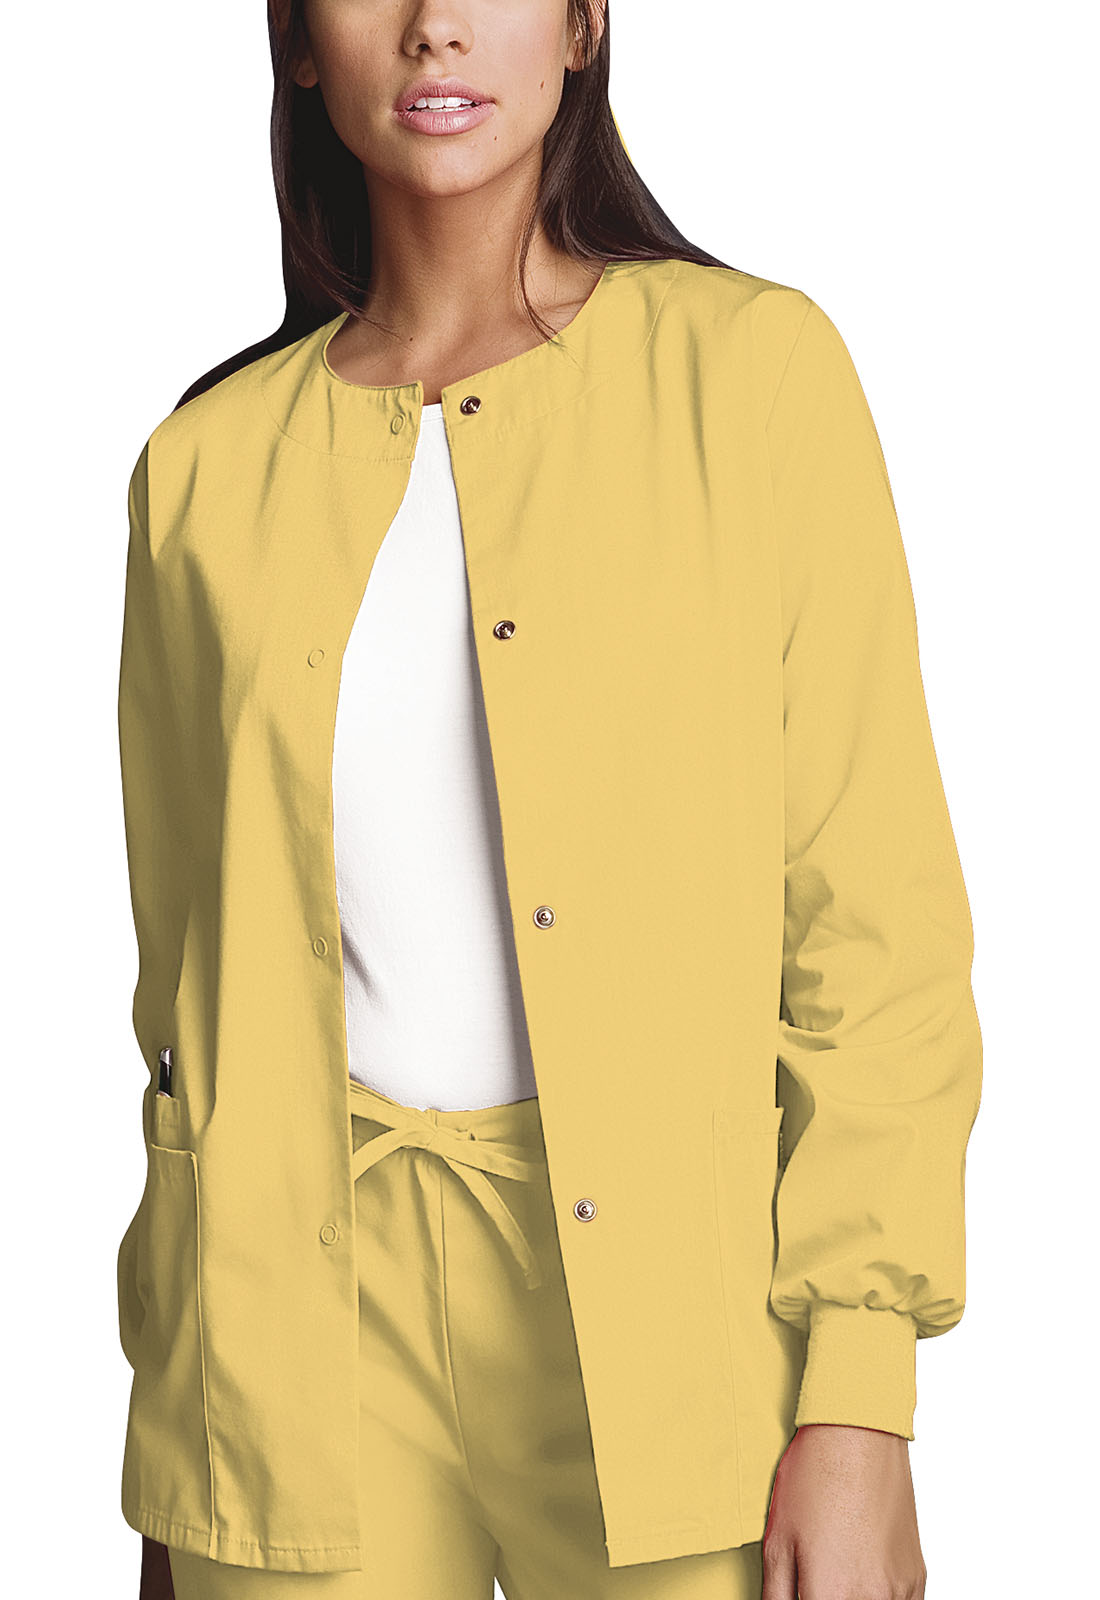 Cherokee Workwear Originals Snap Front WarmUp Jacket 4350 WRDS Words of Love